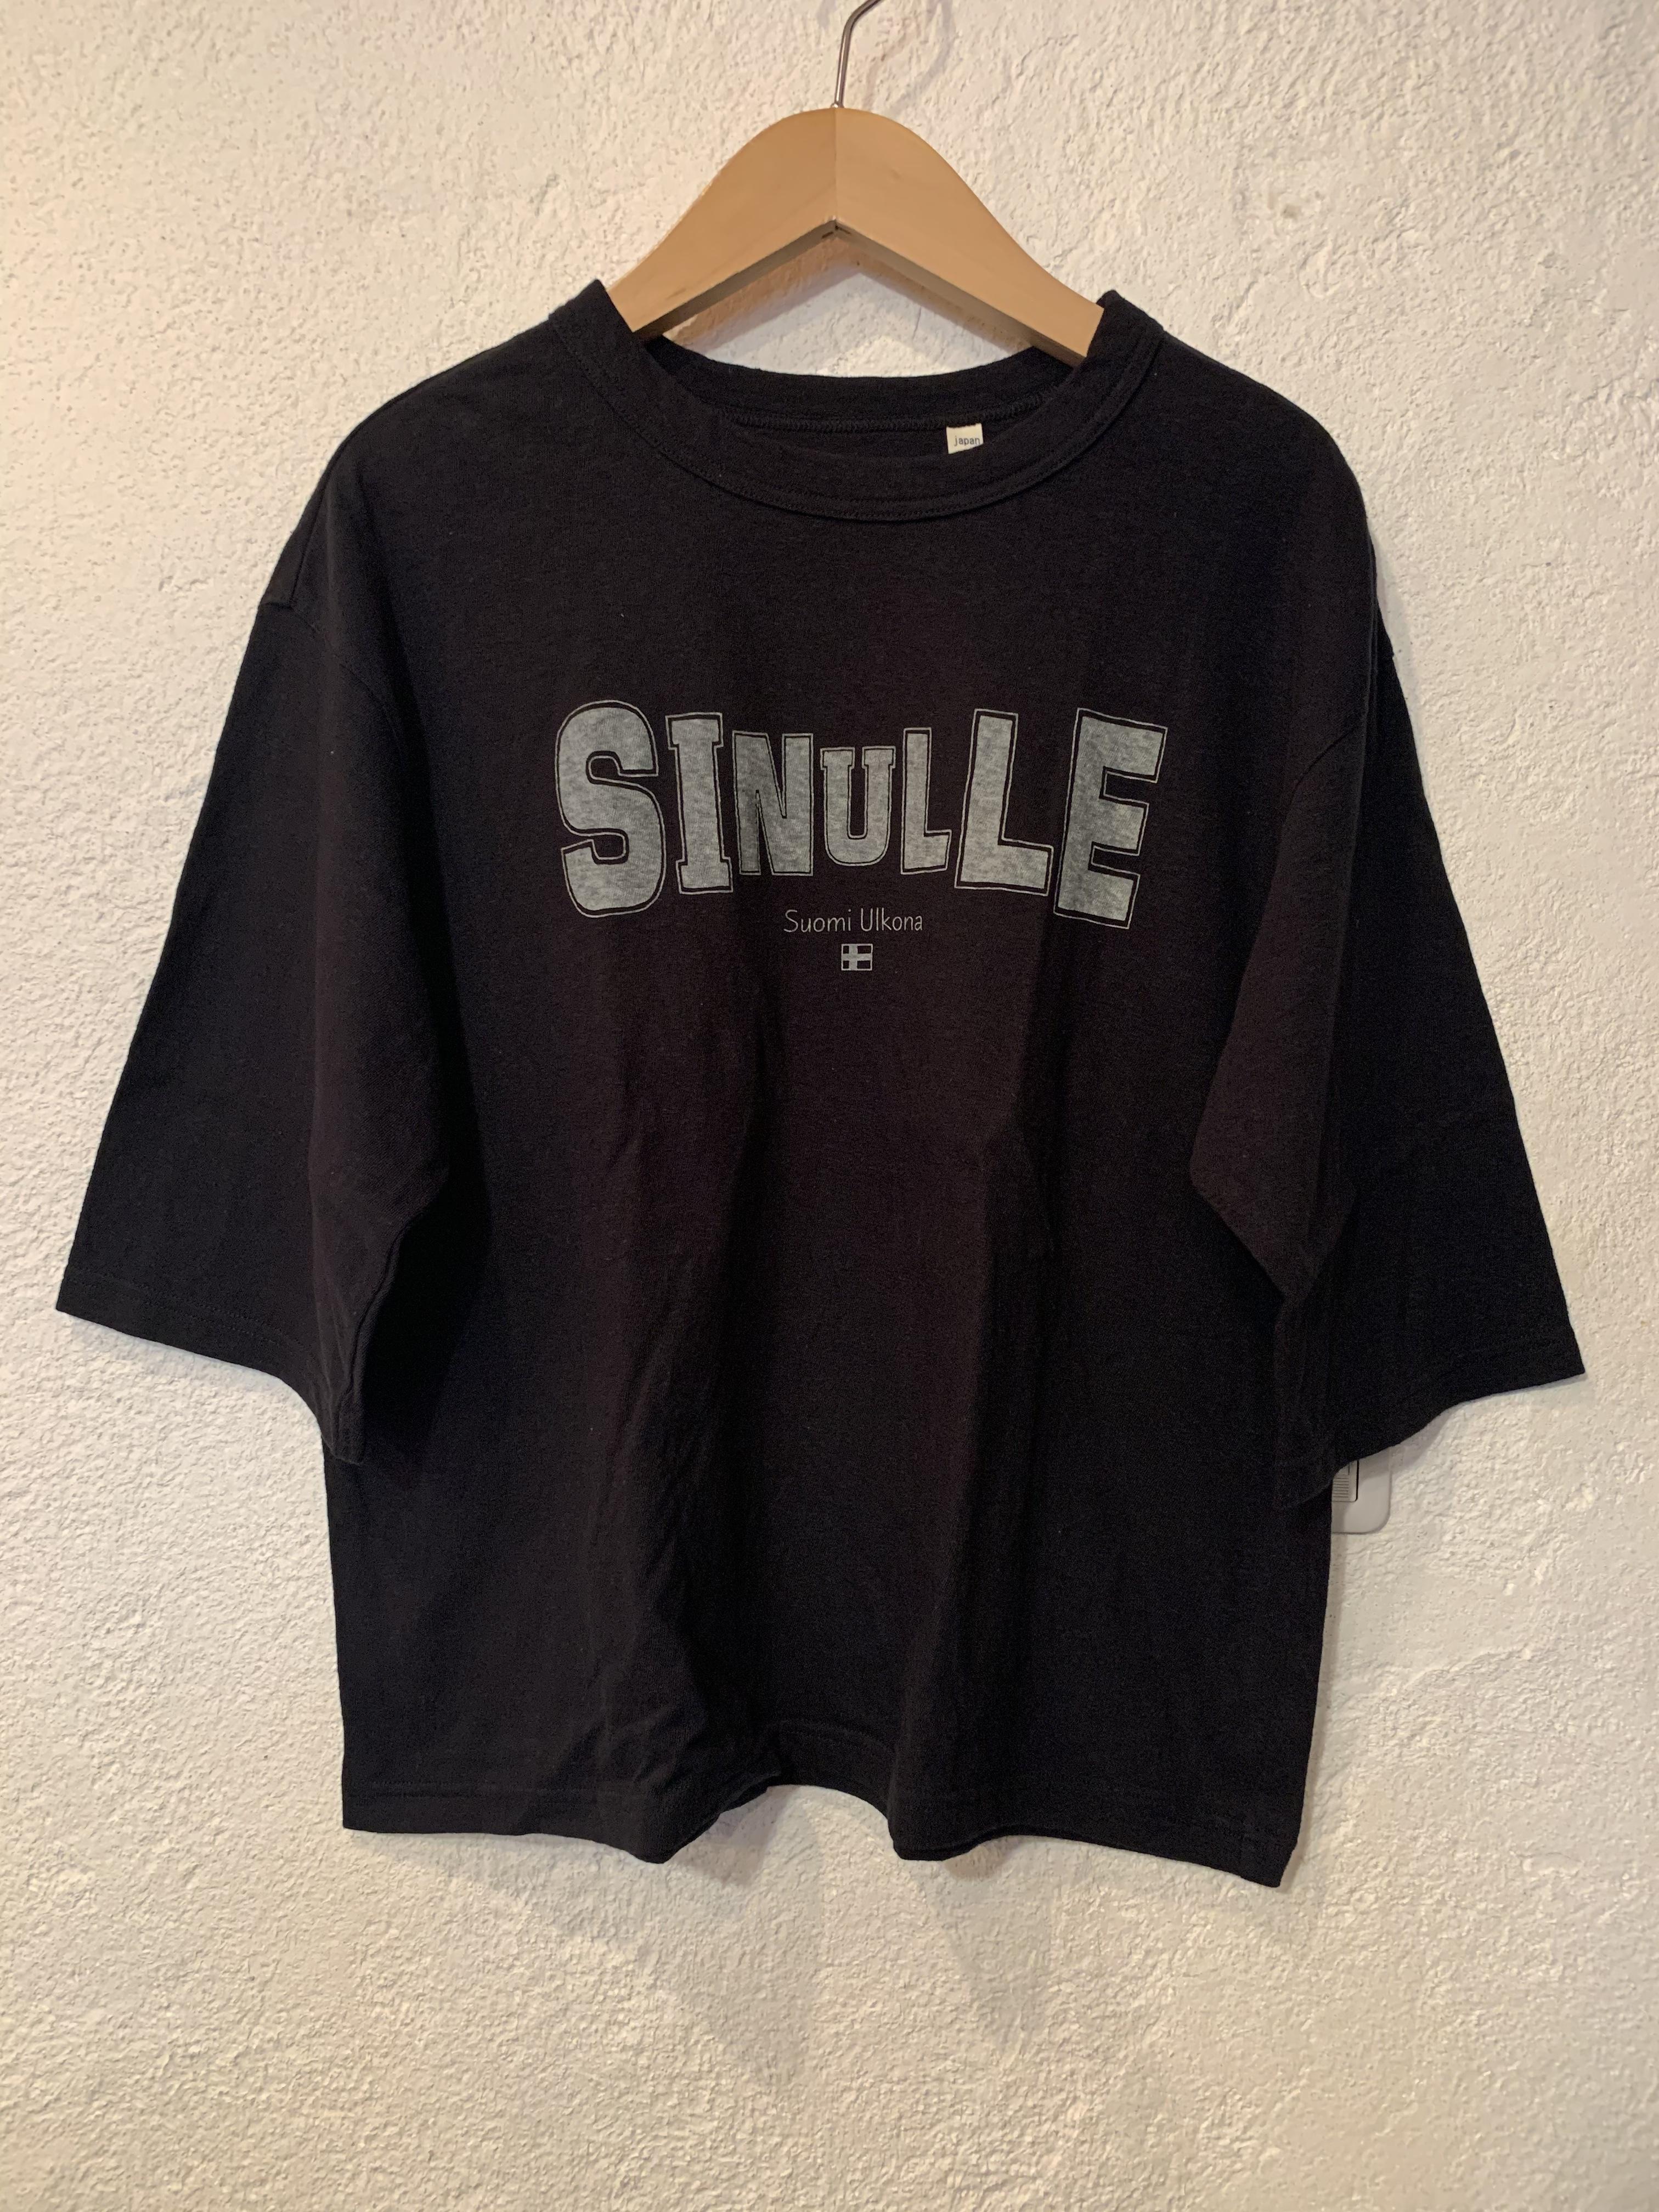 Chloro sister/toujours/プリント5分袖Tシャツ ブラック